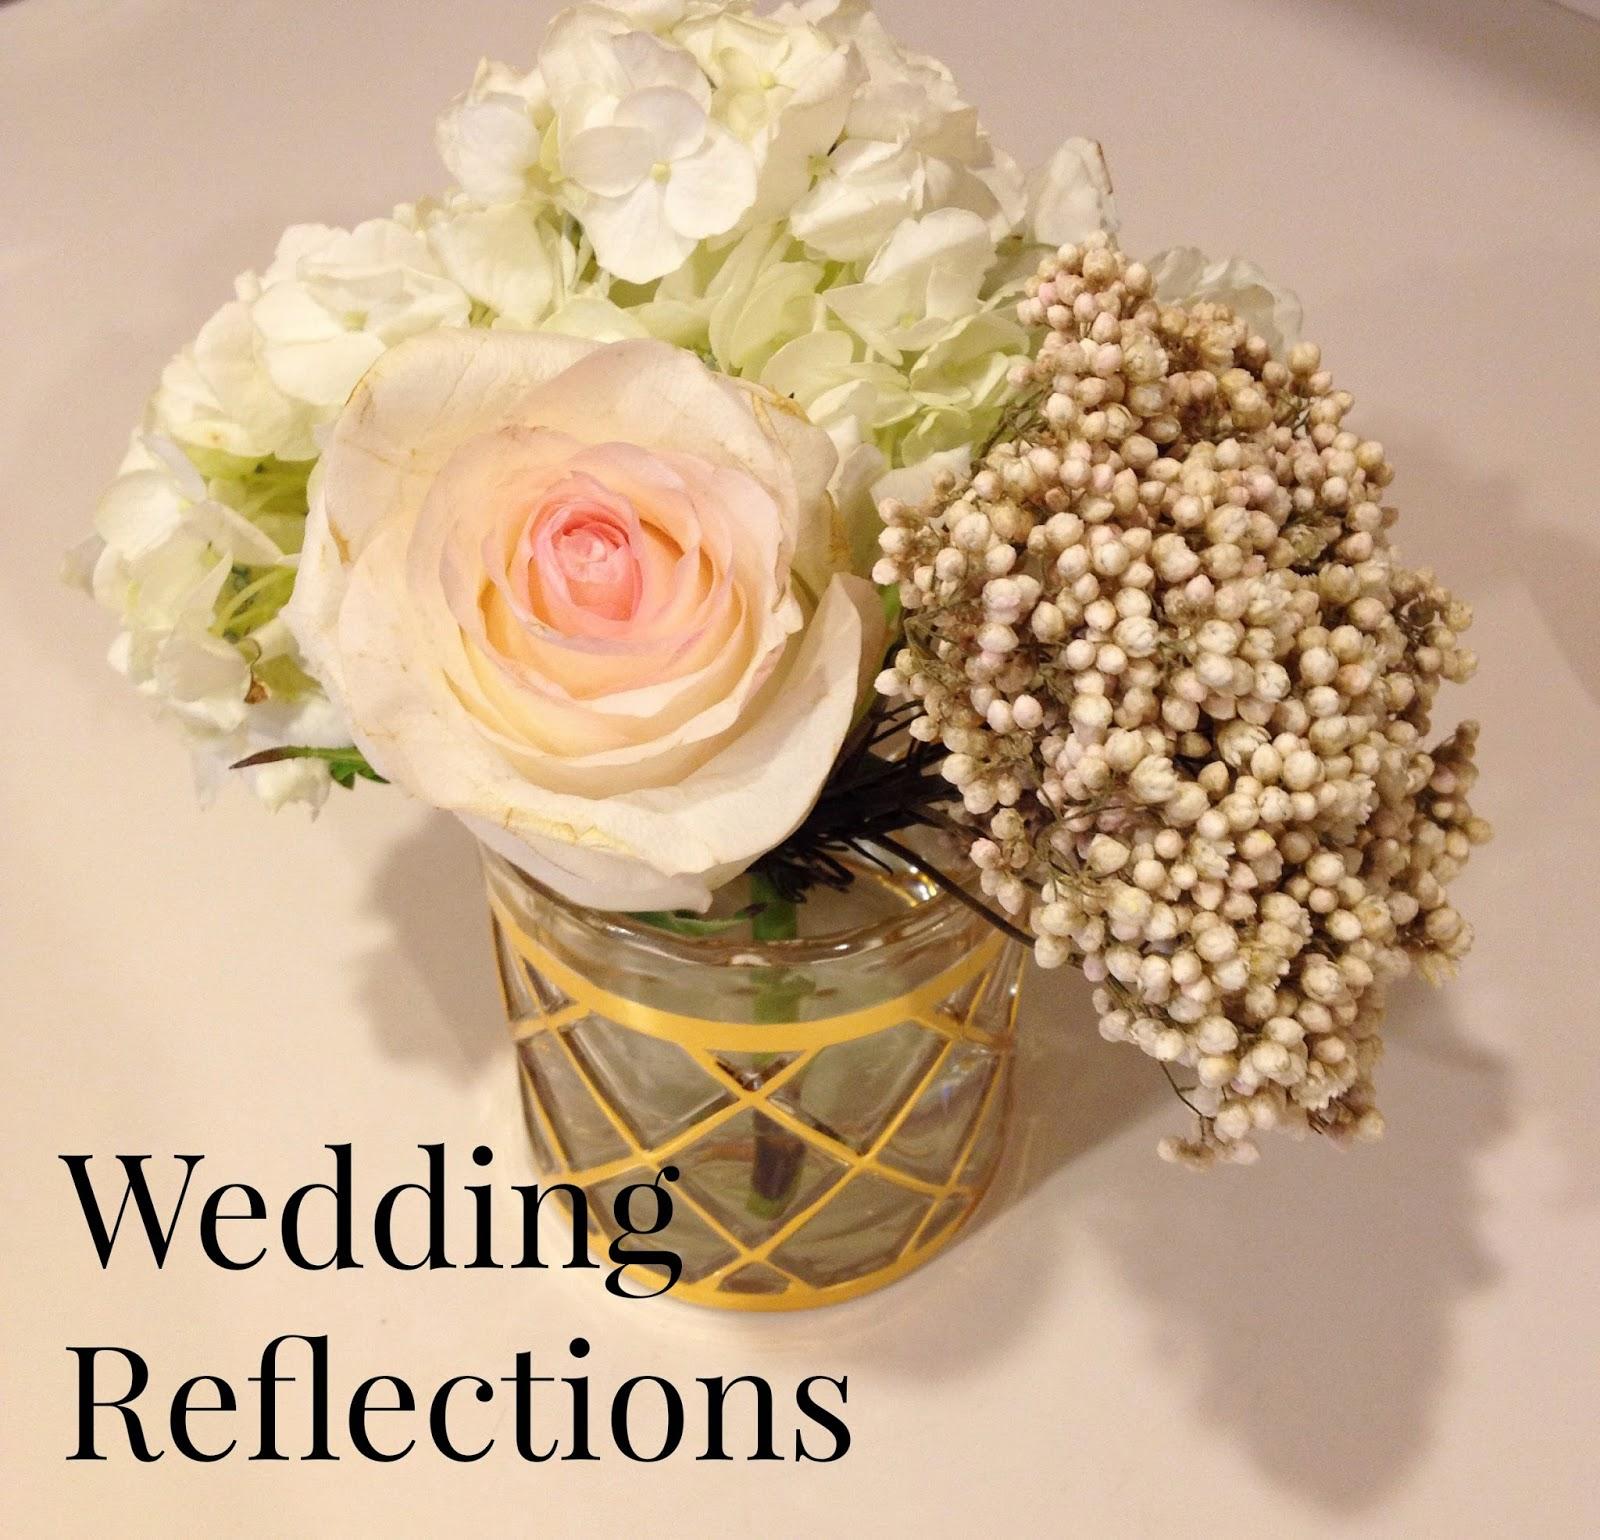 wedding, planning a wedding, wedding planning